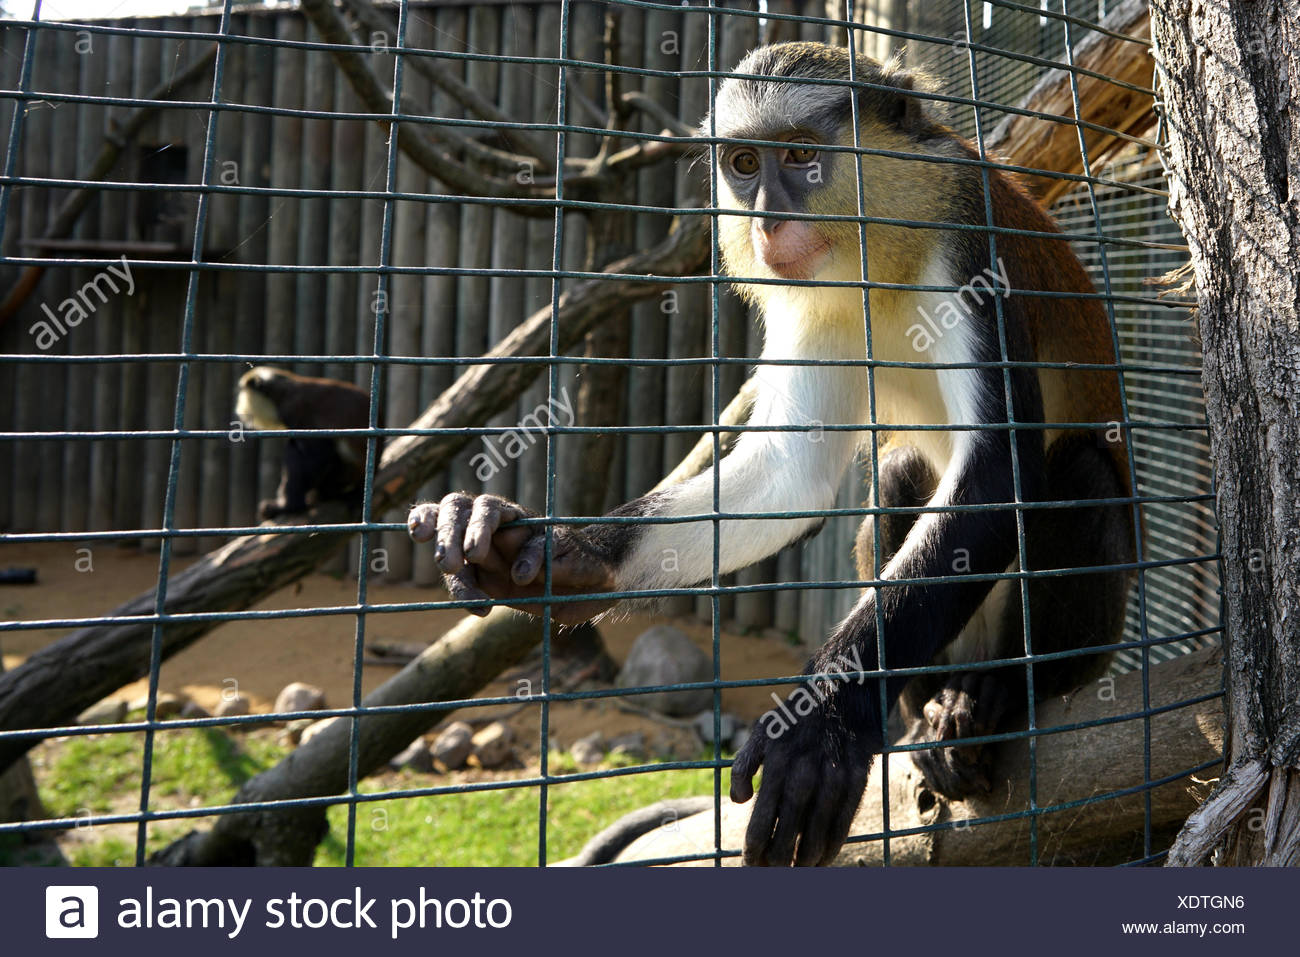 imprisoned monkey in a zoo - Stock Image